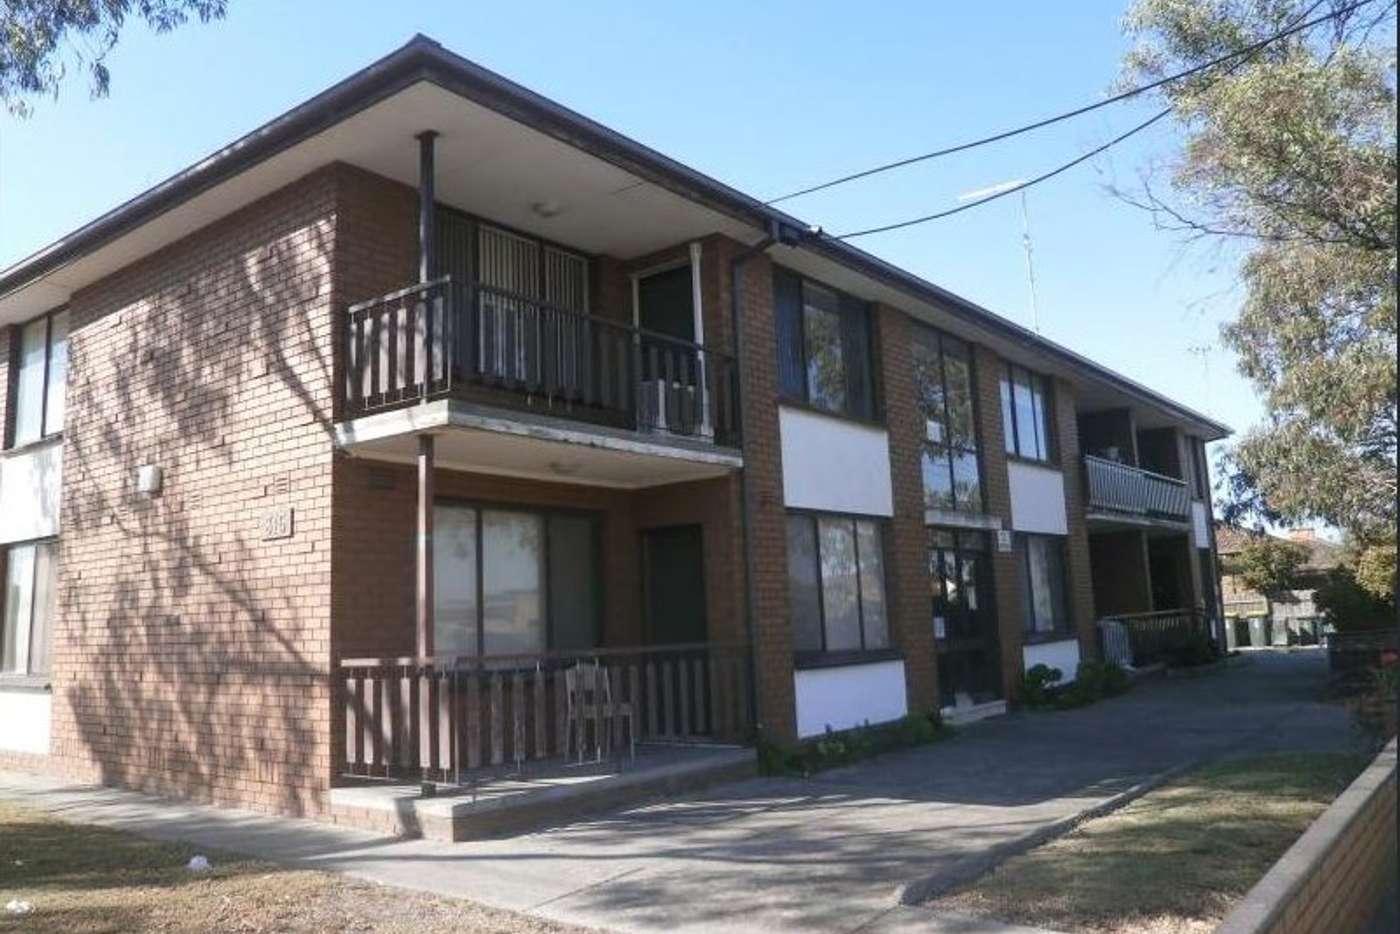 Main view of Homely apartment listing, 4/315 Blackshaws Road, Altona North VIC 3025